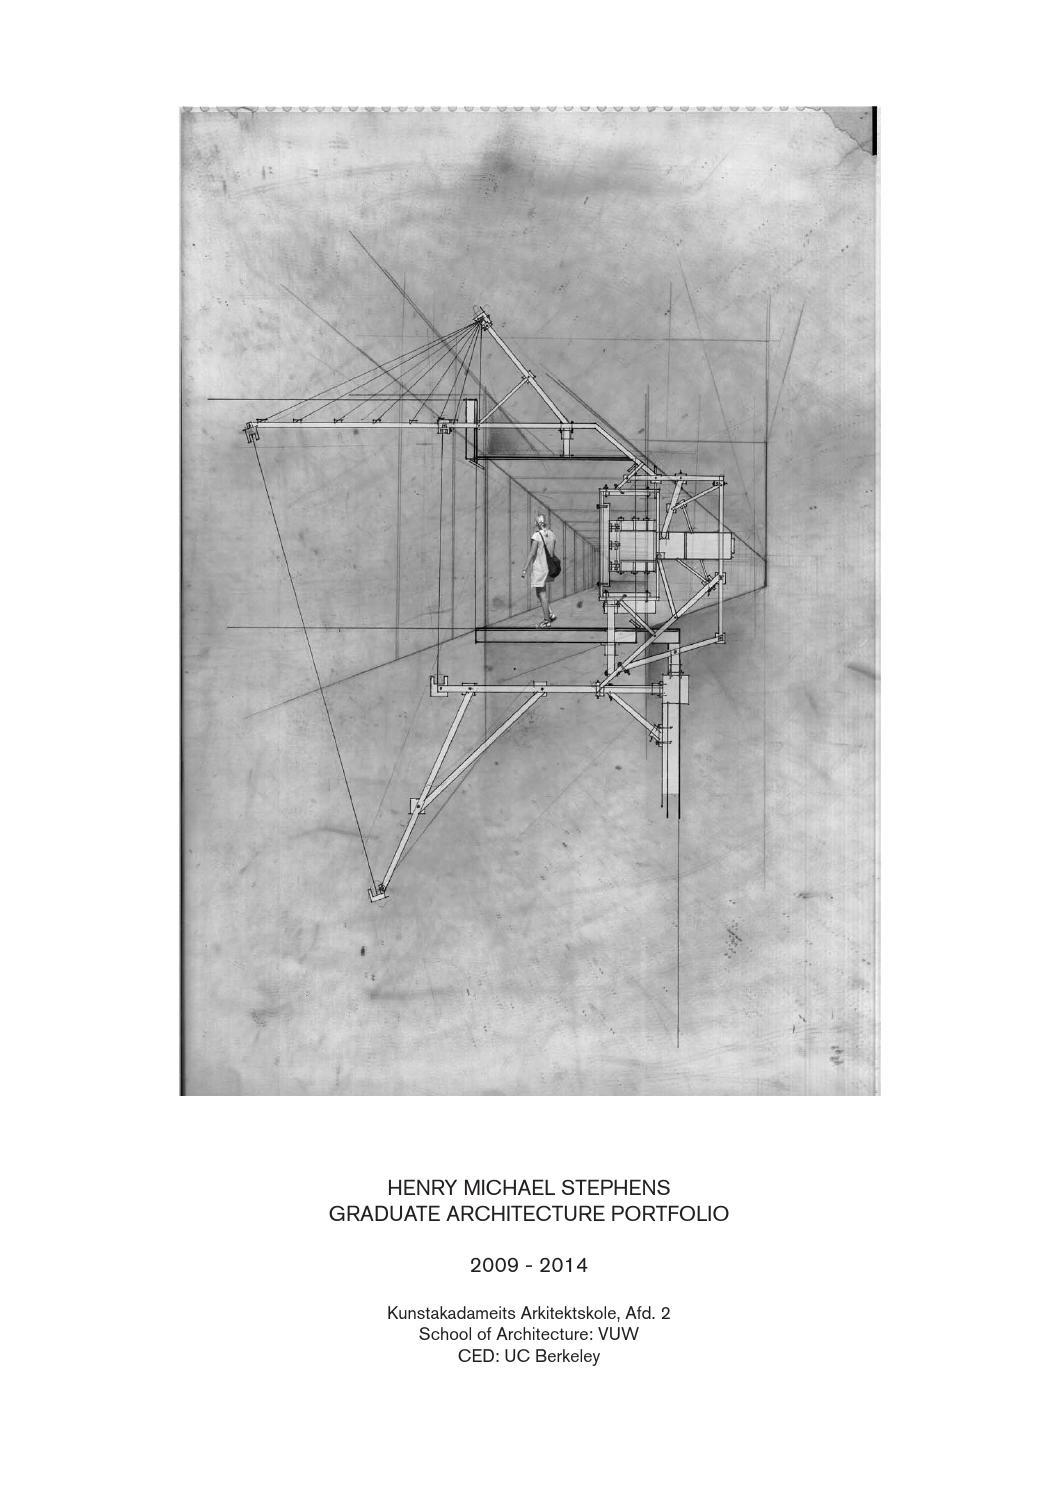 Henry Stephens Graduate Architecture Portfolio By